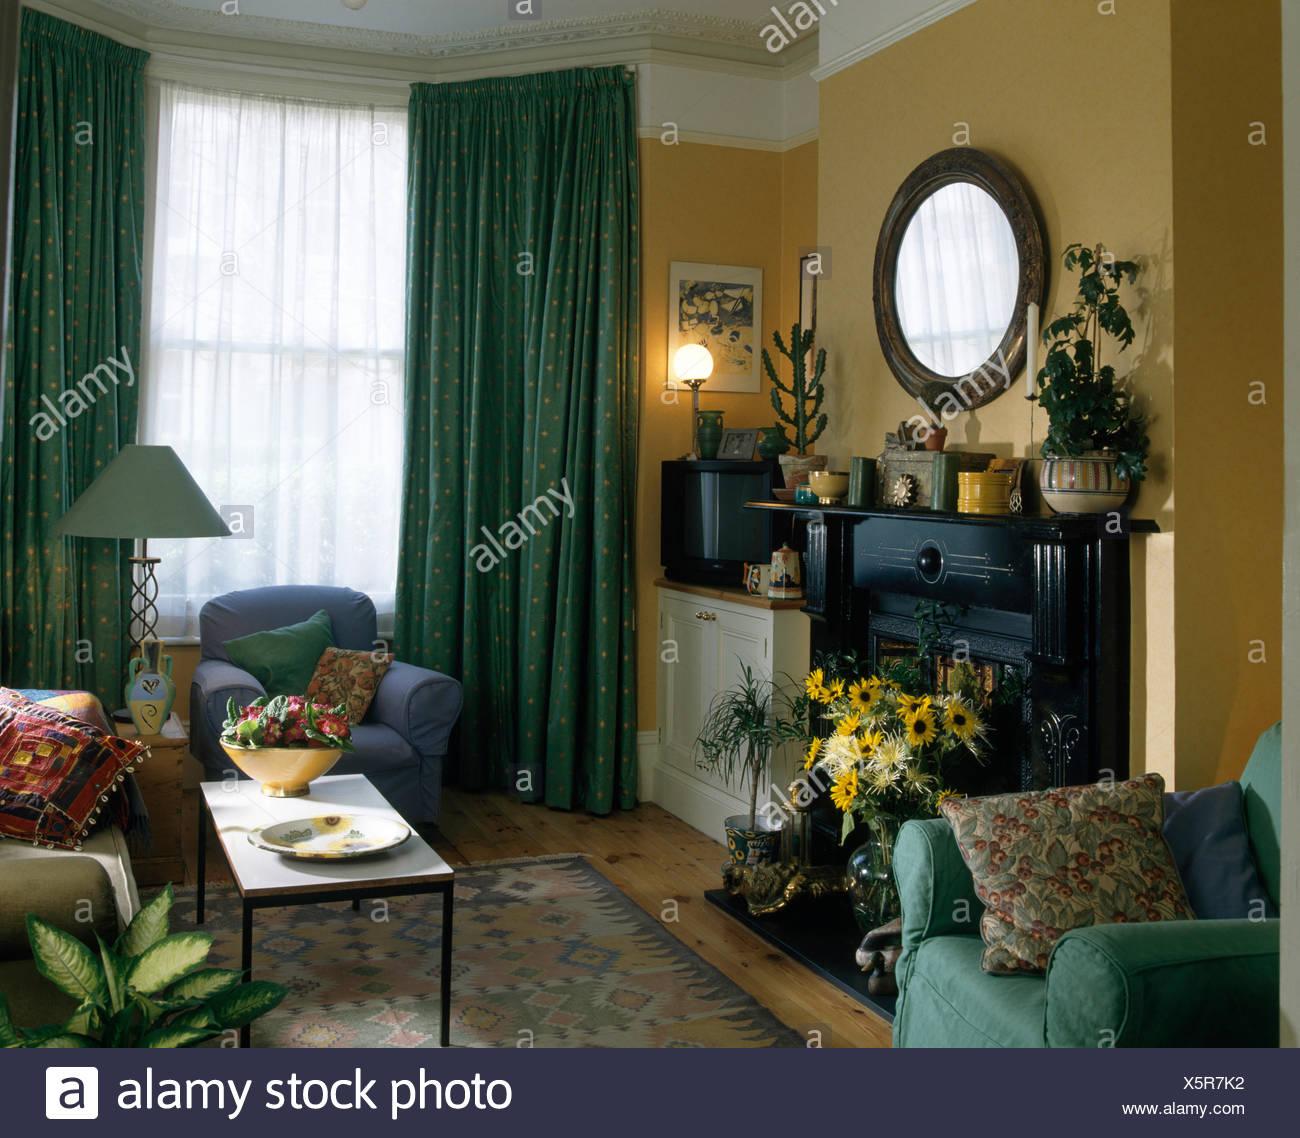 Vase Of Yellow Summer Flowers In Fireplace In Nineties